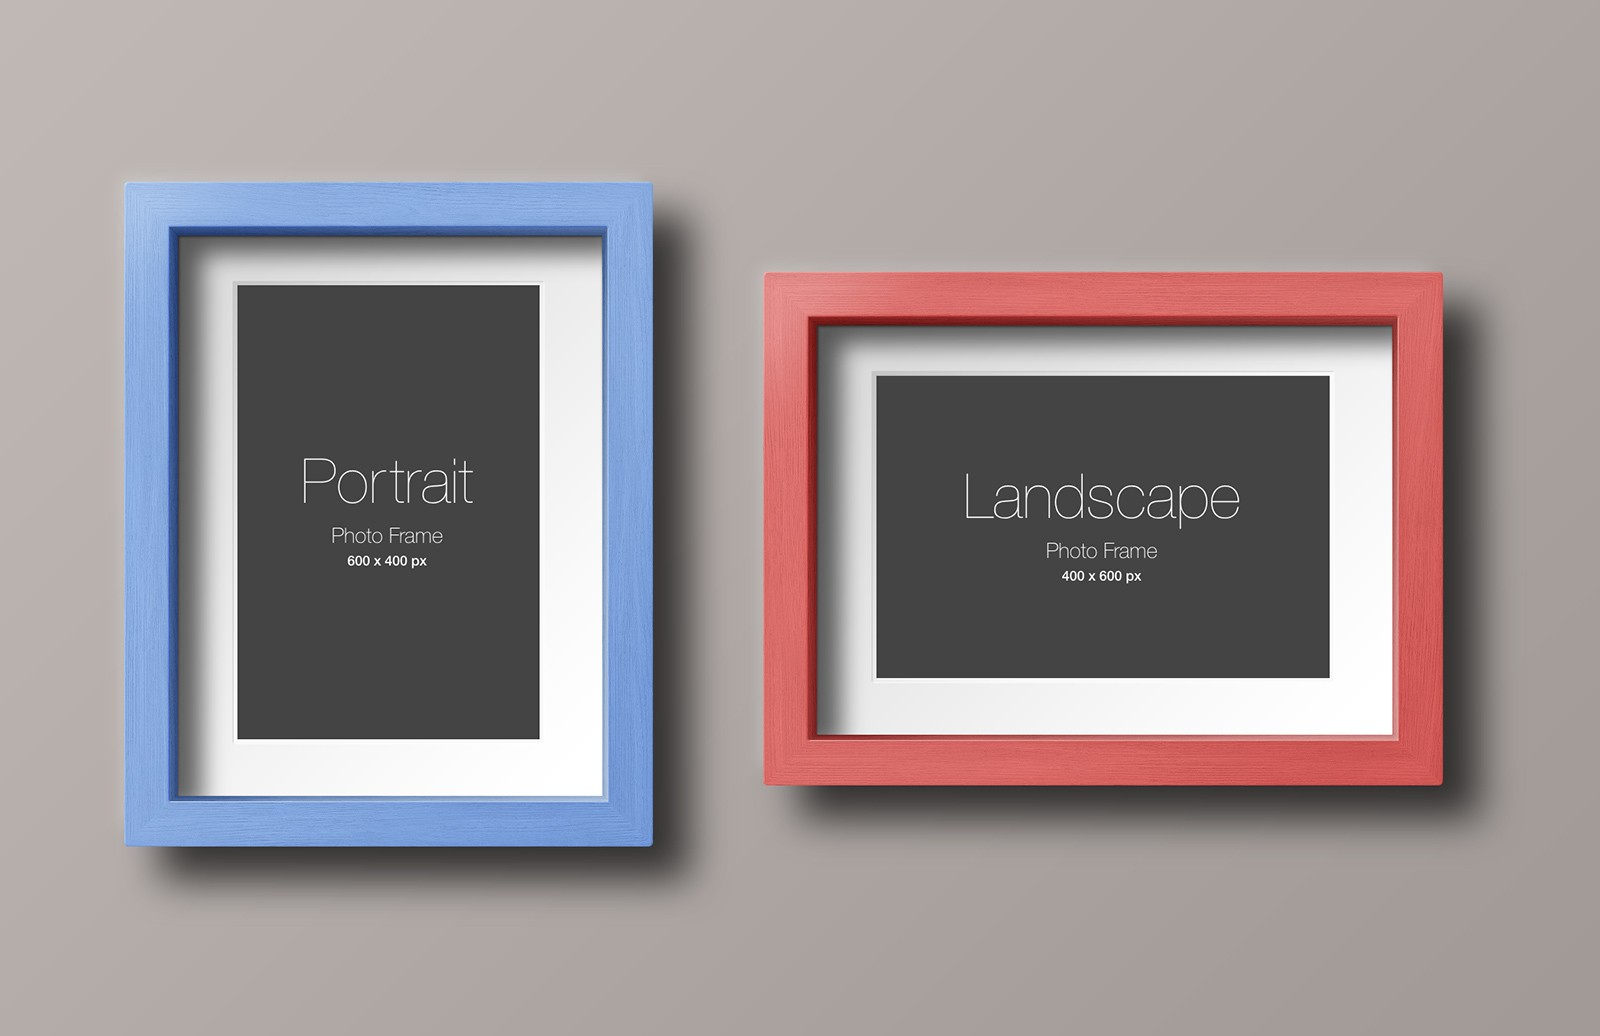 50 realistic frame mockup templates decolore net